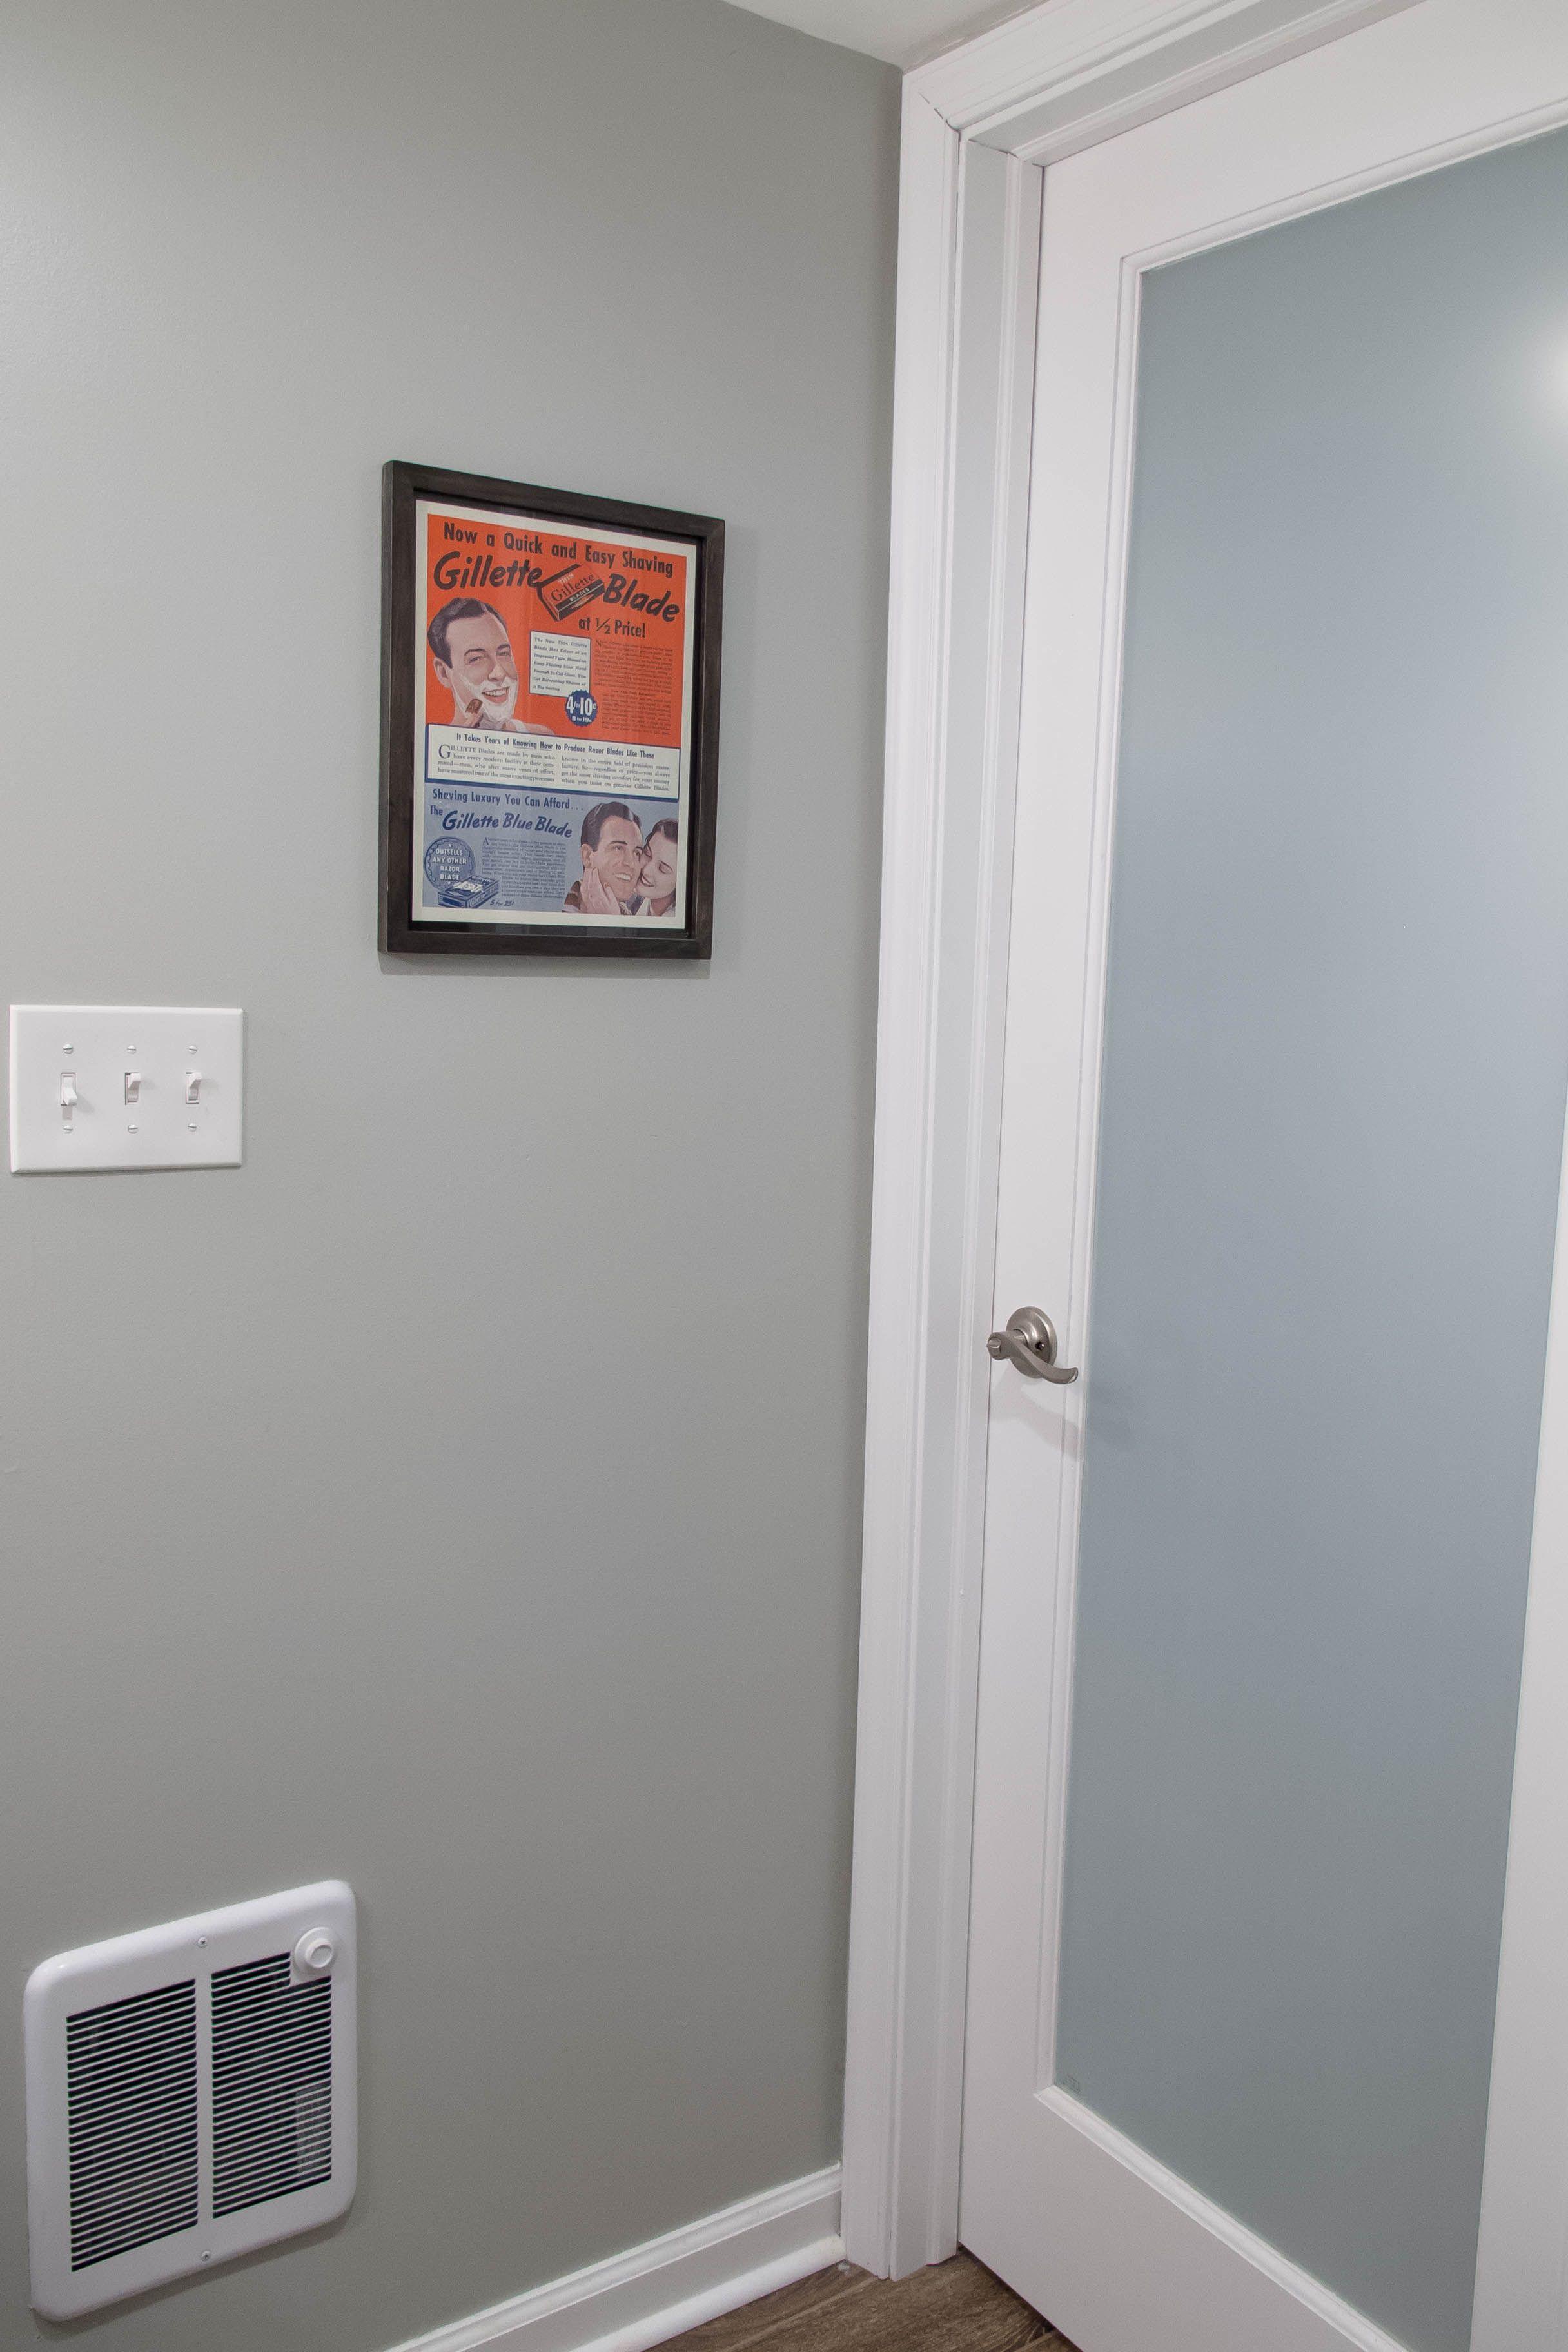 Below Grade Beauty - Bat Bathroom Addition | Build What You ... on basement additions, room additions, glass additions, small masterbath additions, garage additions, building additions, outdoor additions, fireplace additions, master bedroom additions, loft additions,